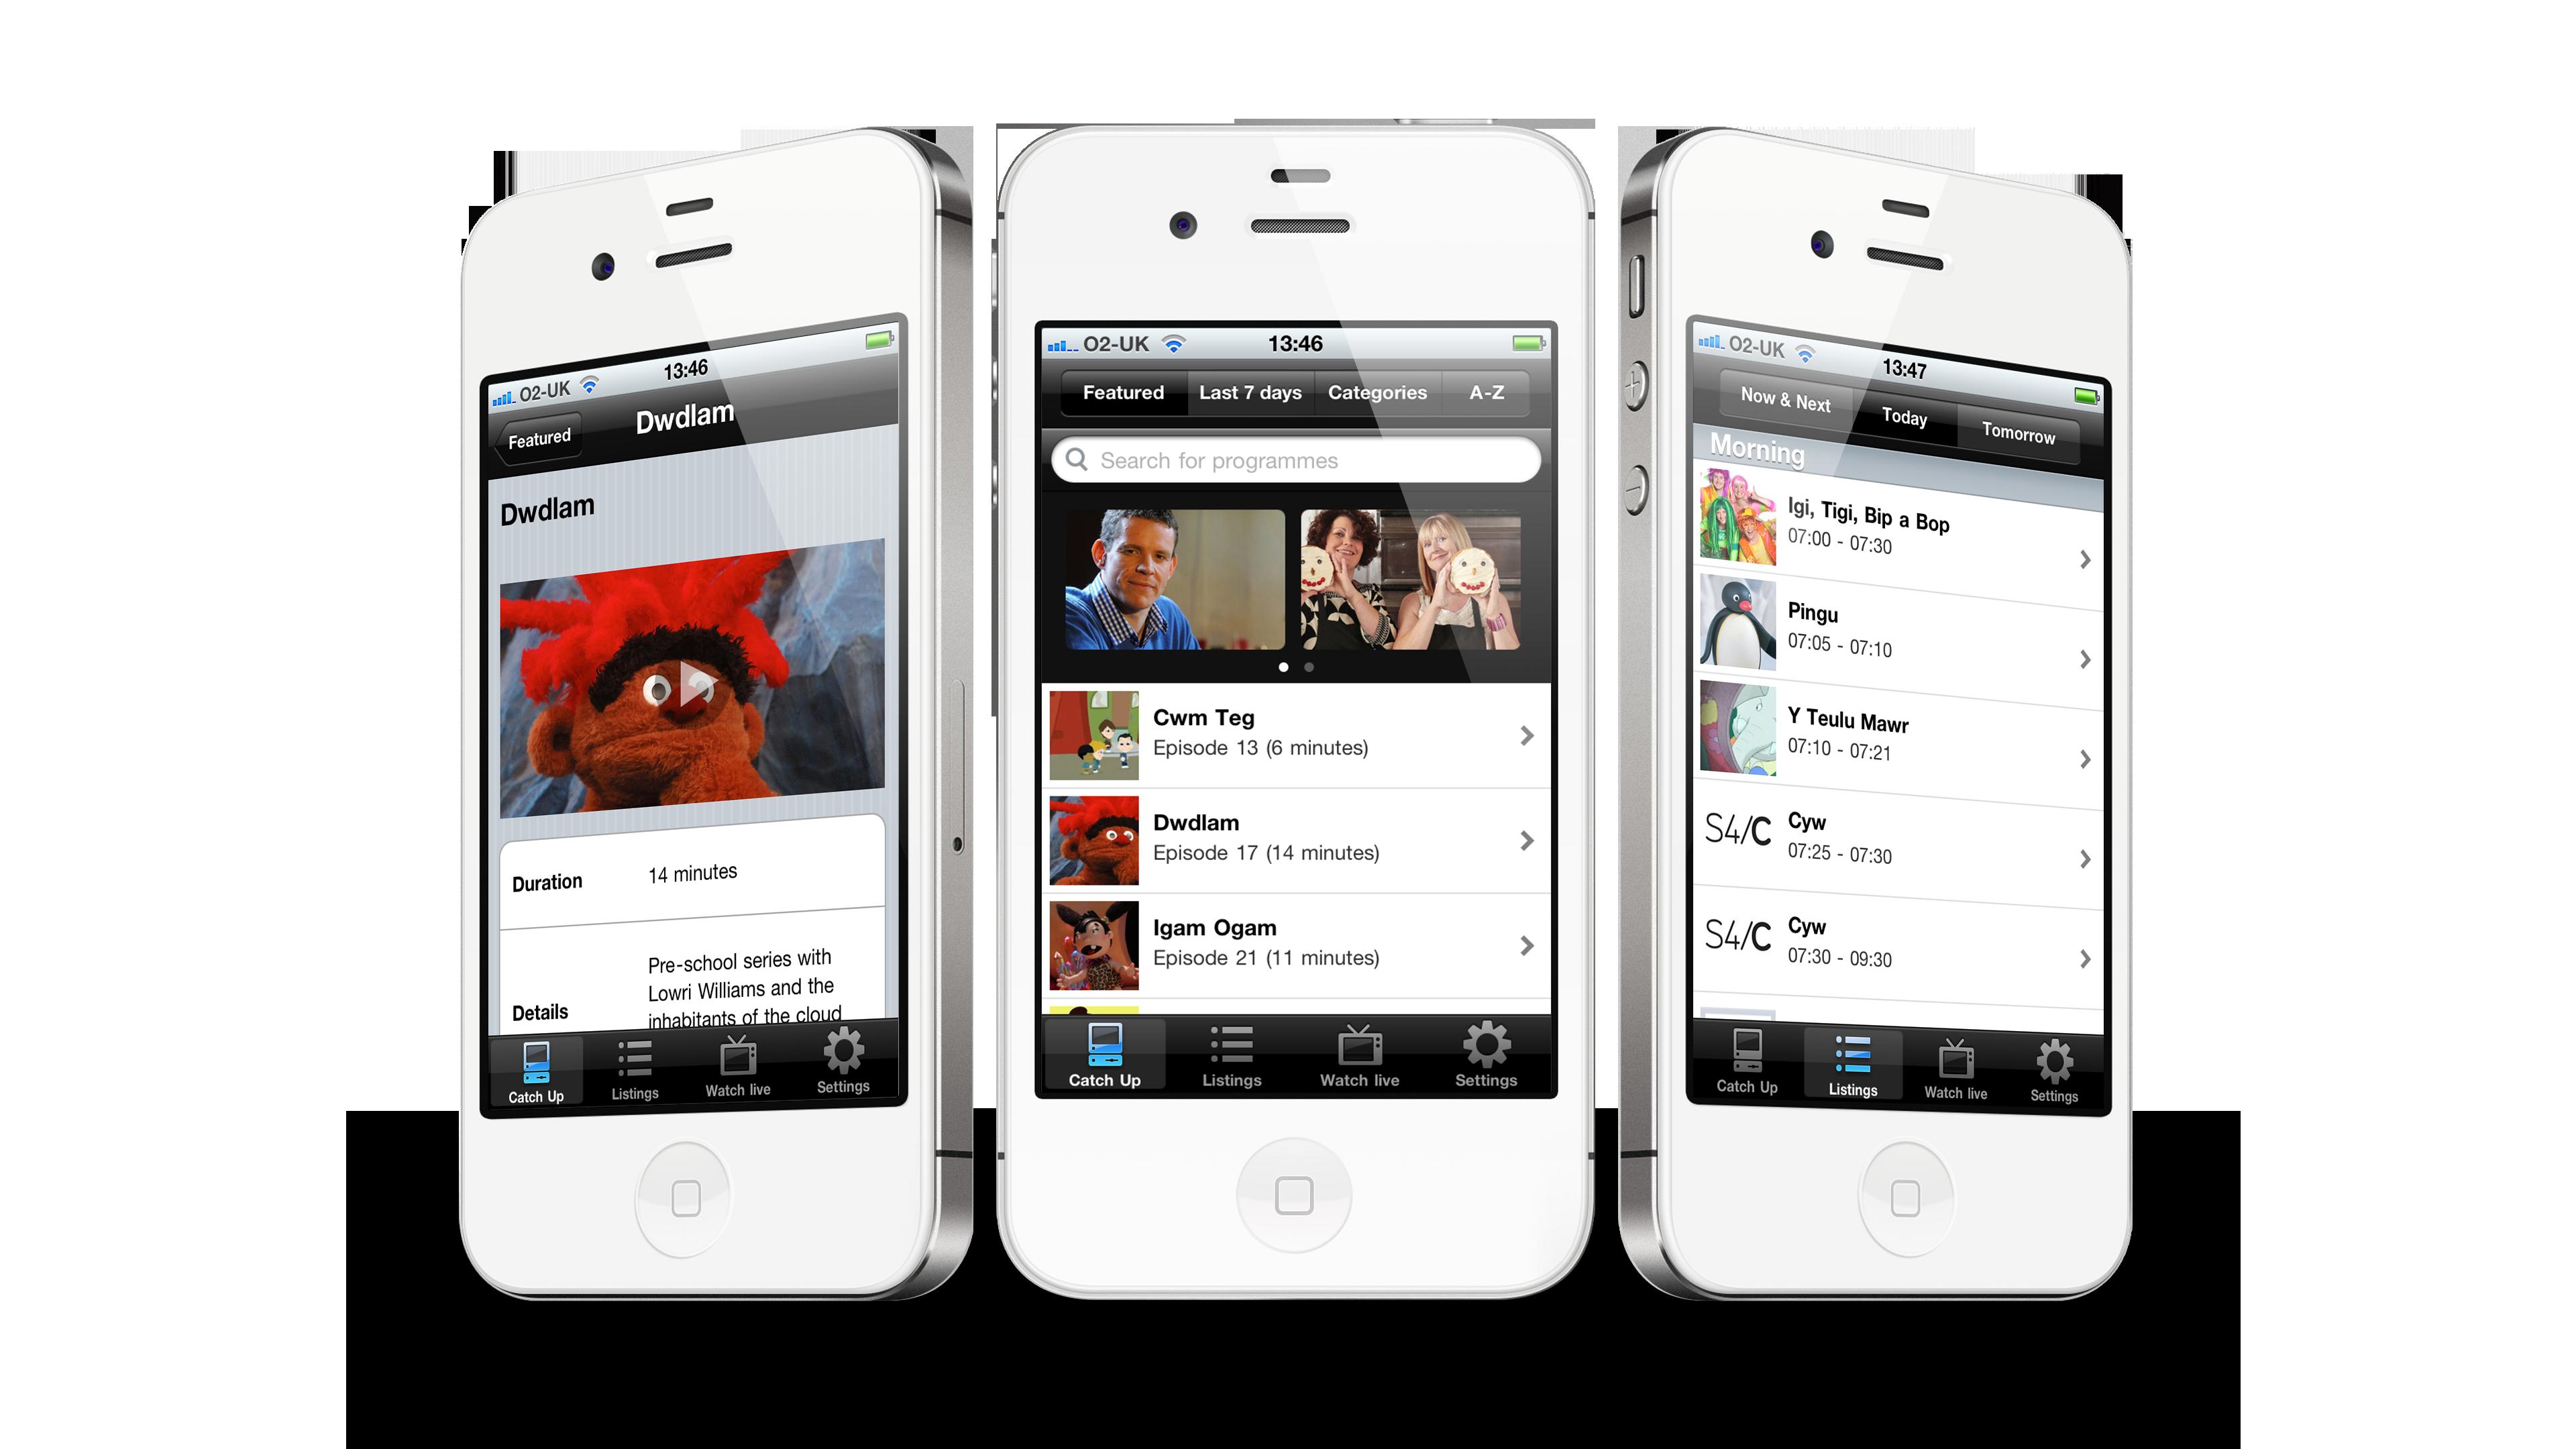 Screenshots of mobile view of S4C app